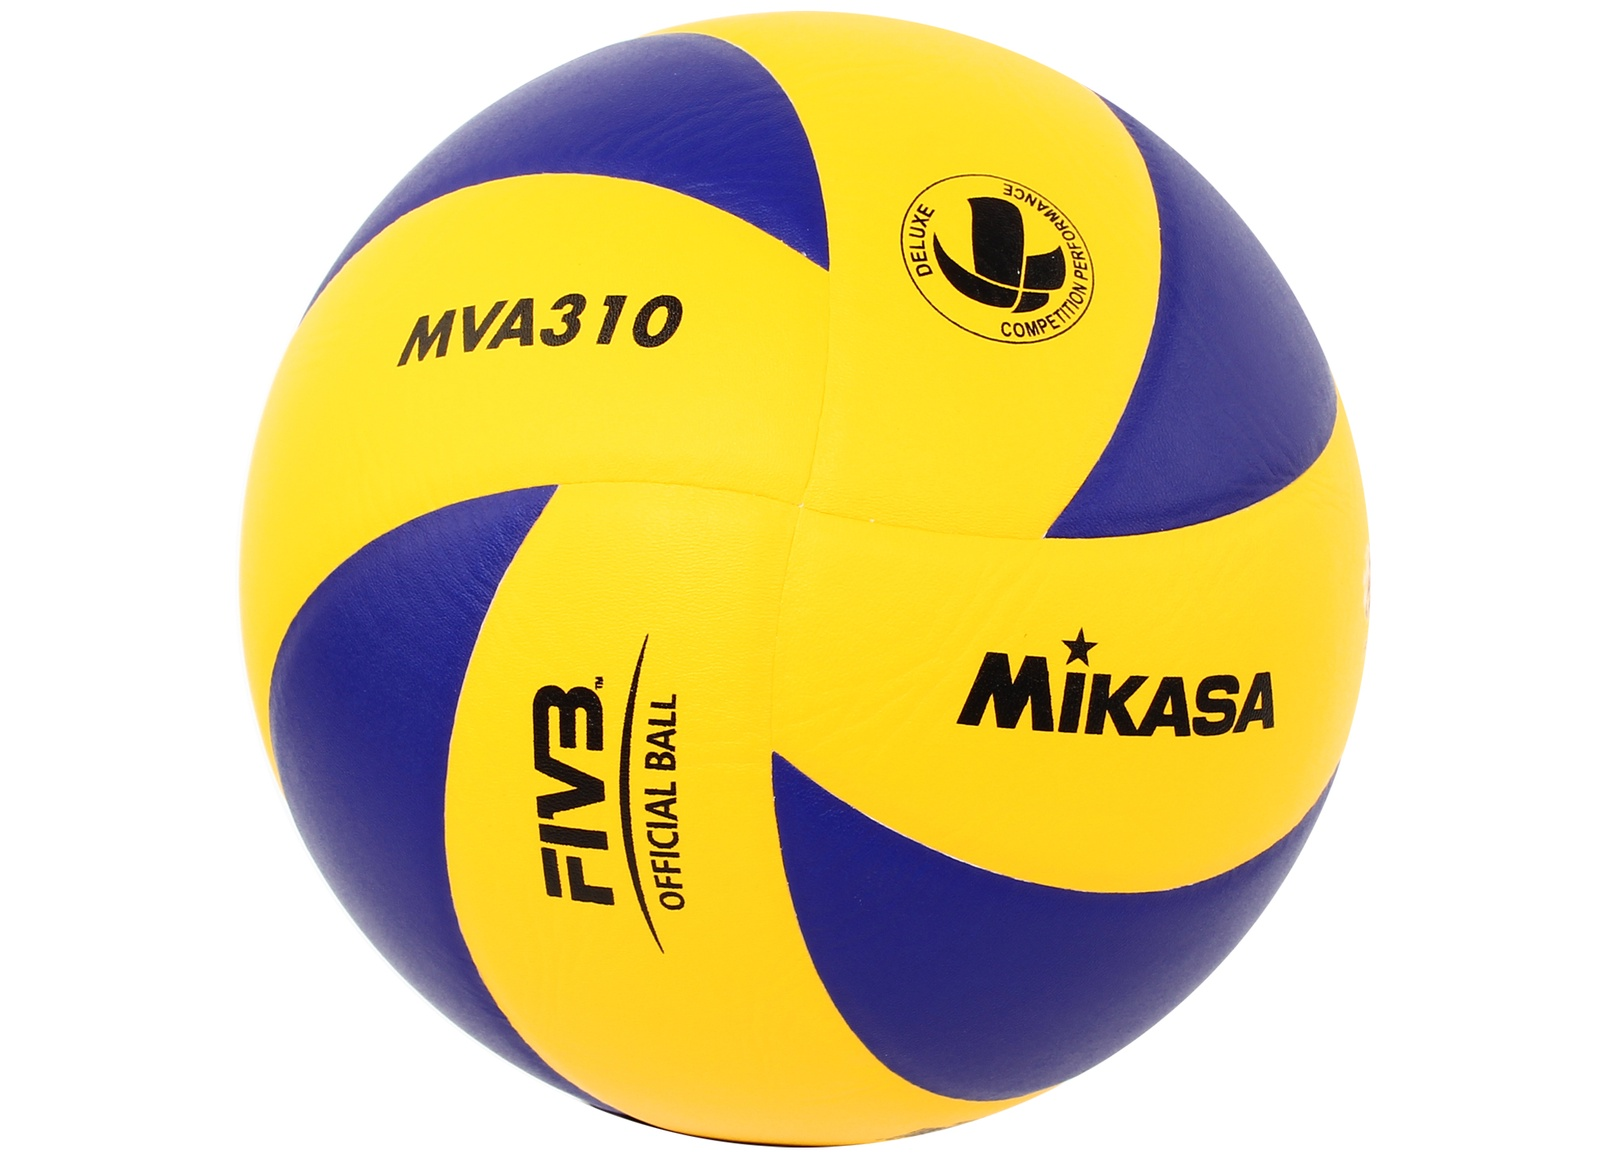 Мяч волейбольный Mikasa, MVA310, синий, желтый, размер 5 мяч волейбольный mikasa mva380k размер 5 сине желтый